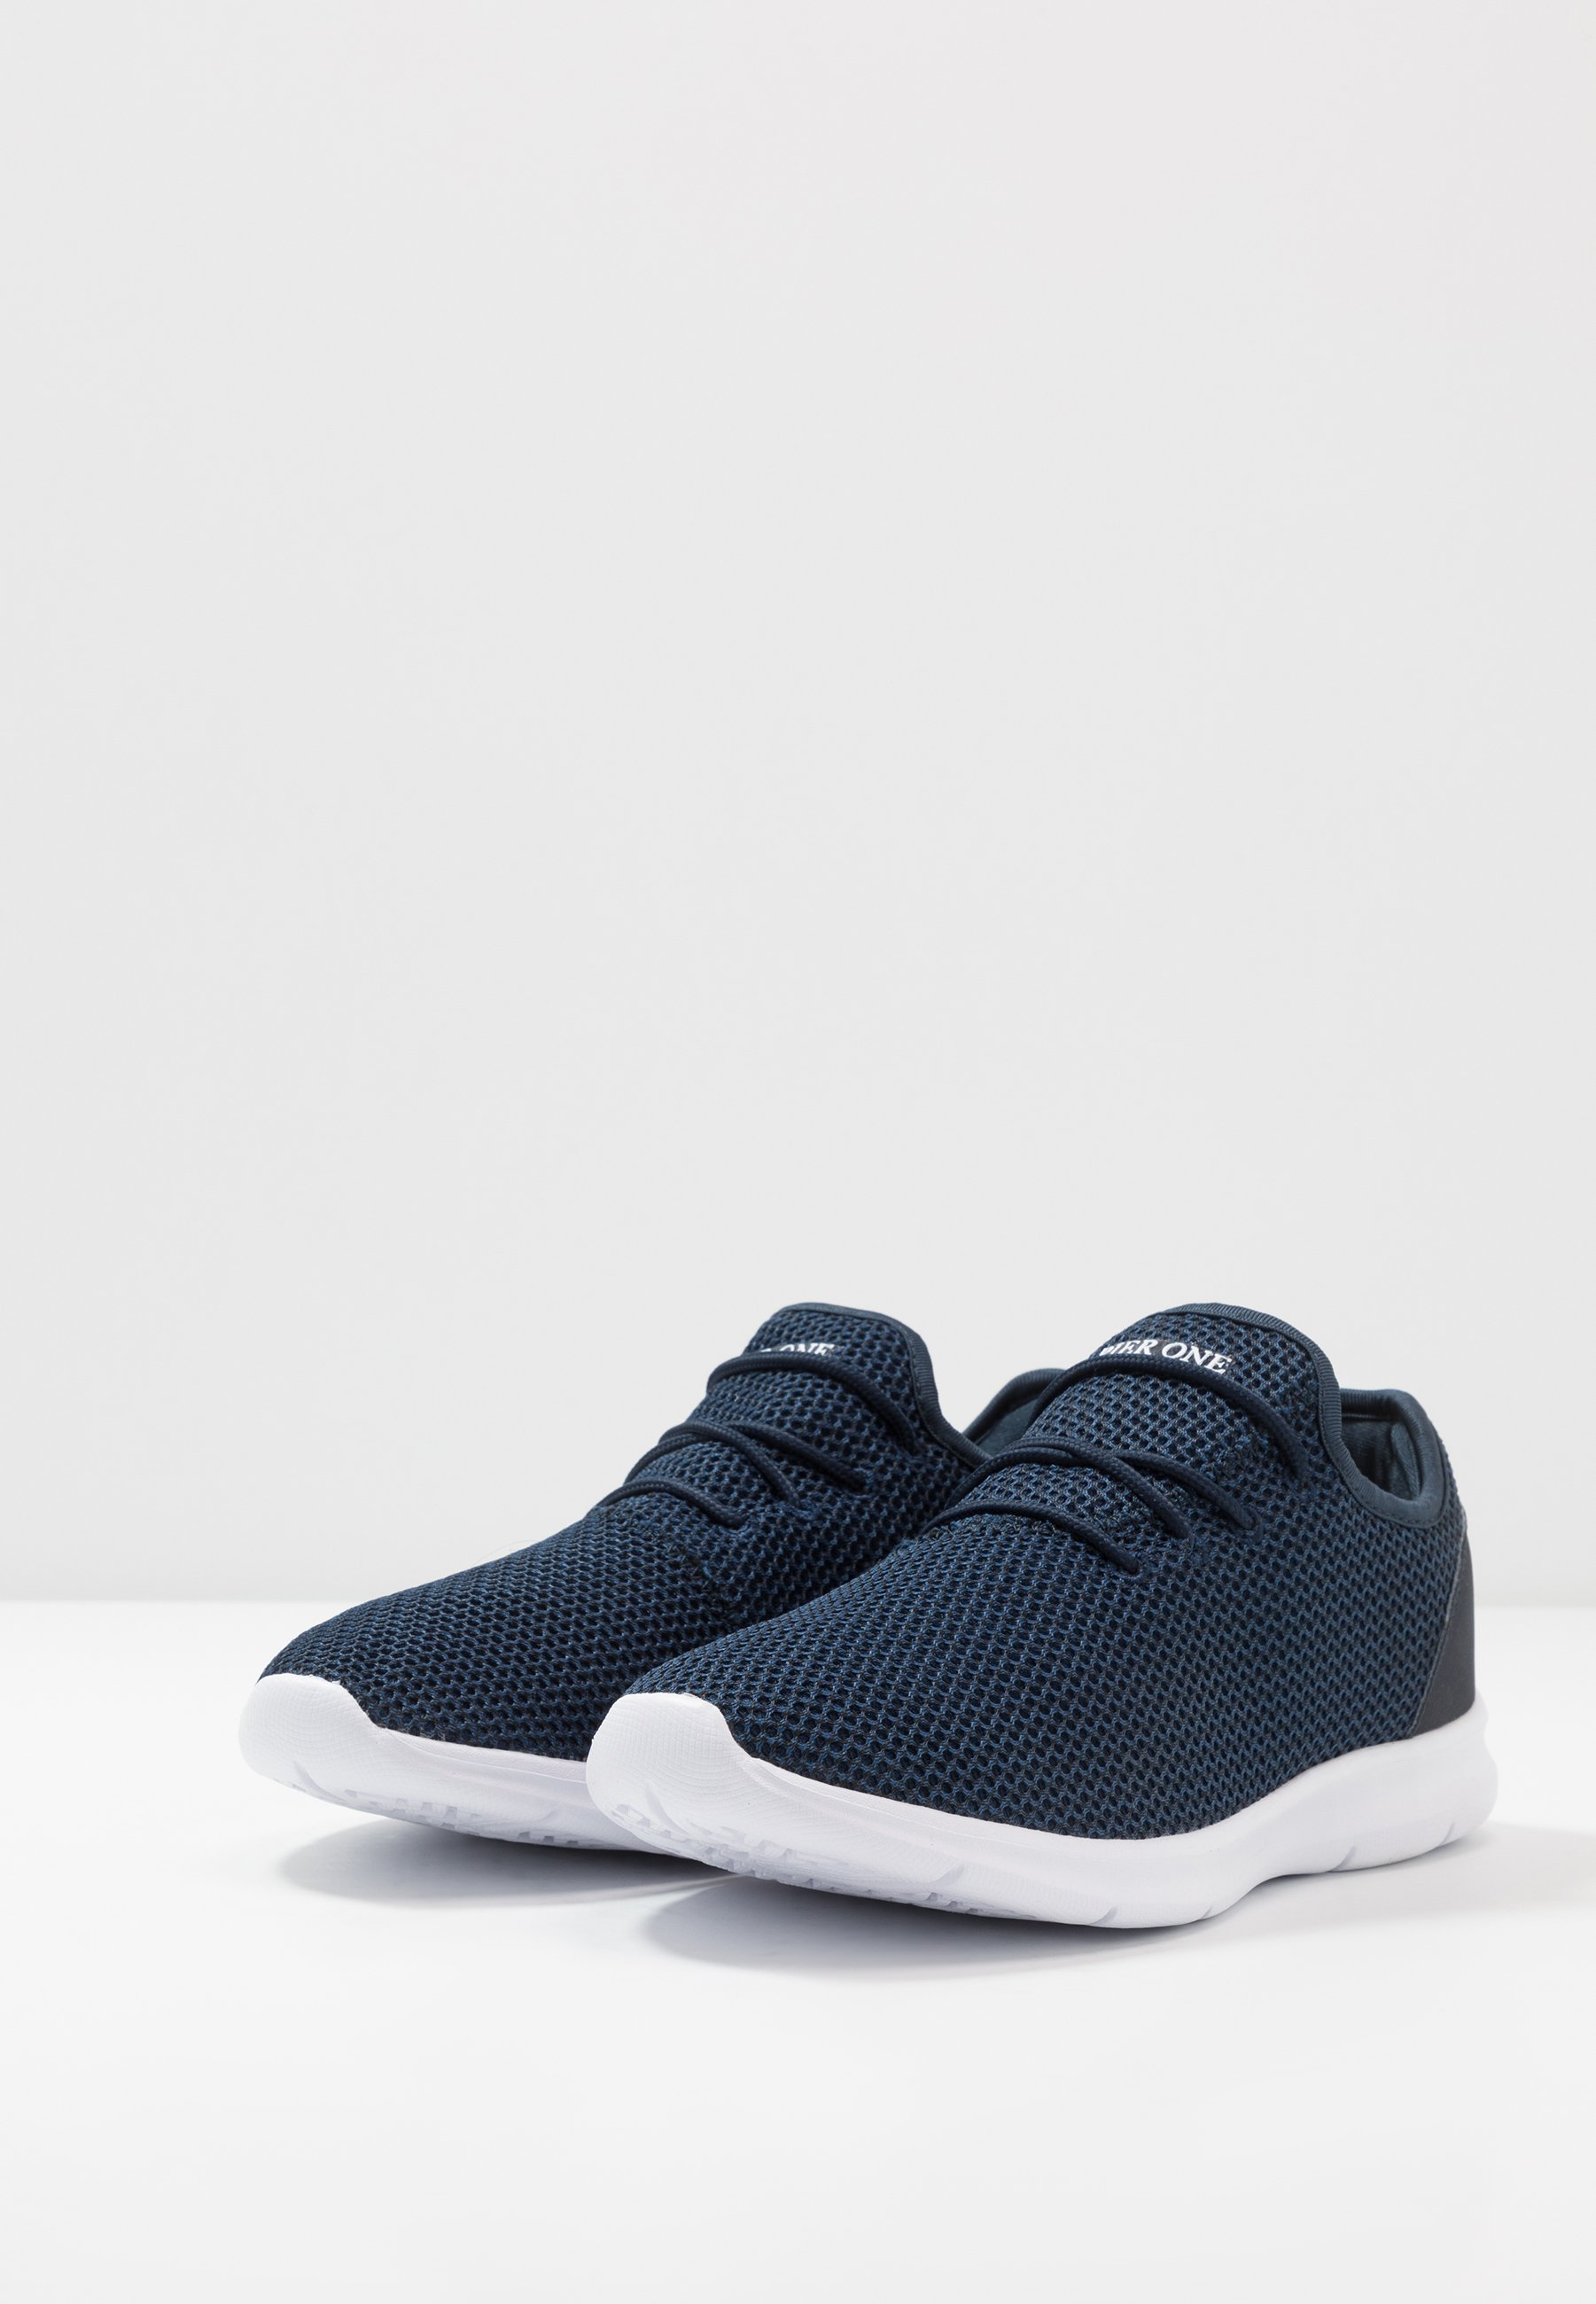 Pier One Sneakers basse - dark blue S8QhDNrk